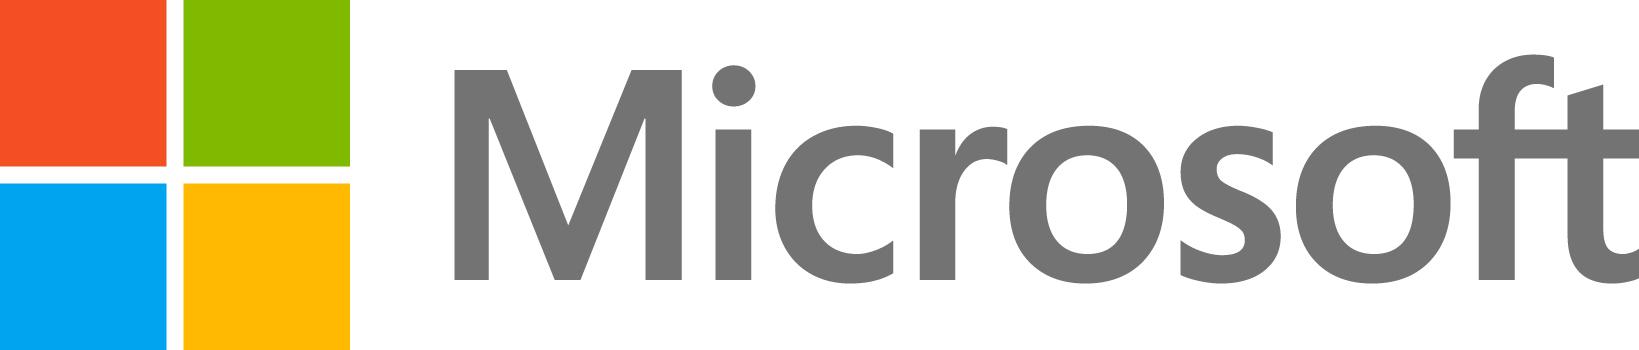 Microsoft_Print